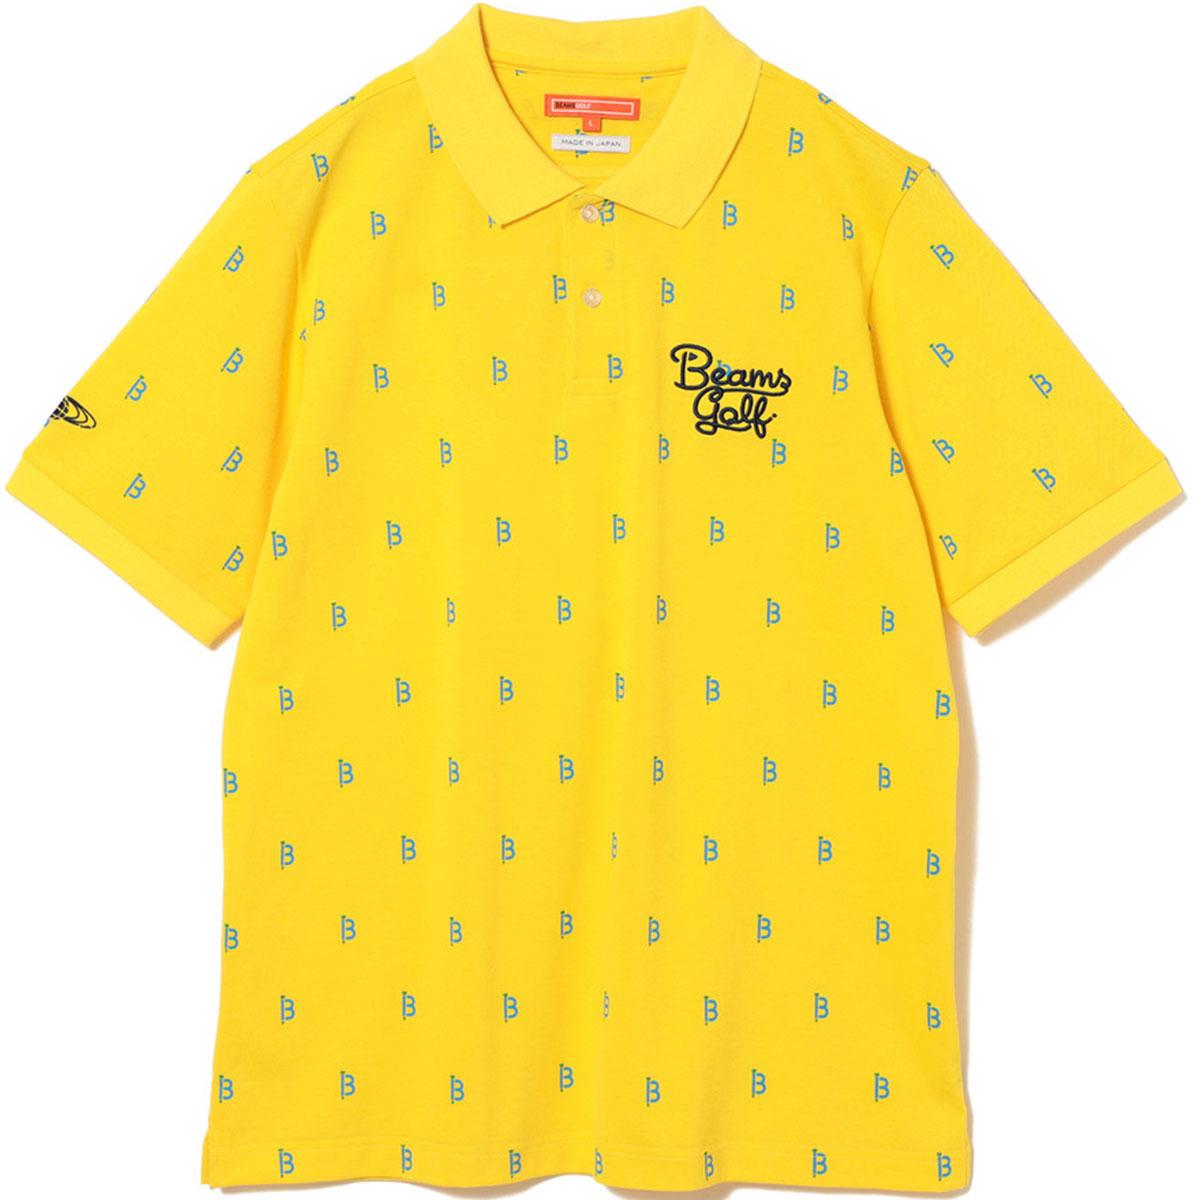 BEAMS GOLF ORANGE LABEL BT総柄 ポロシャツ 2020 FW